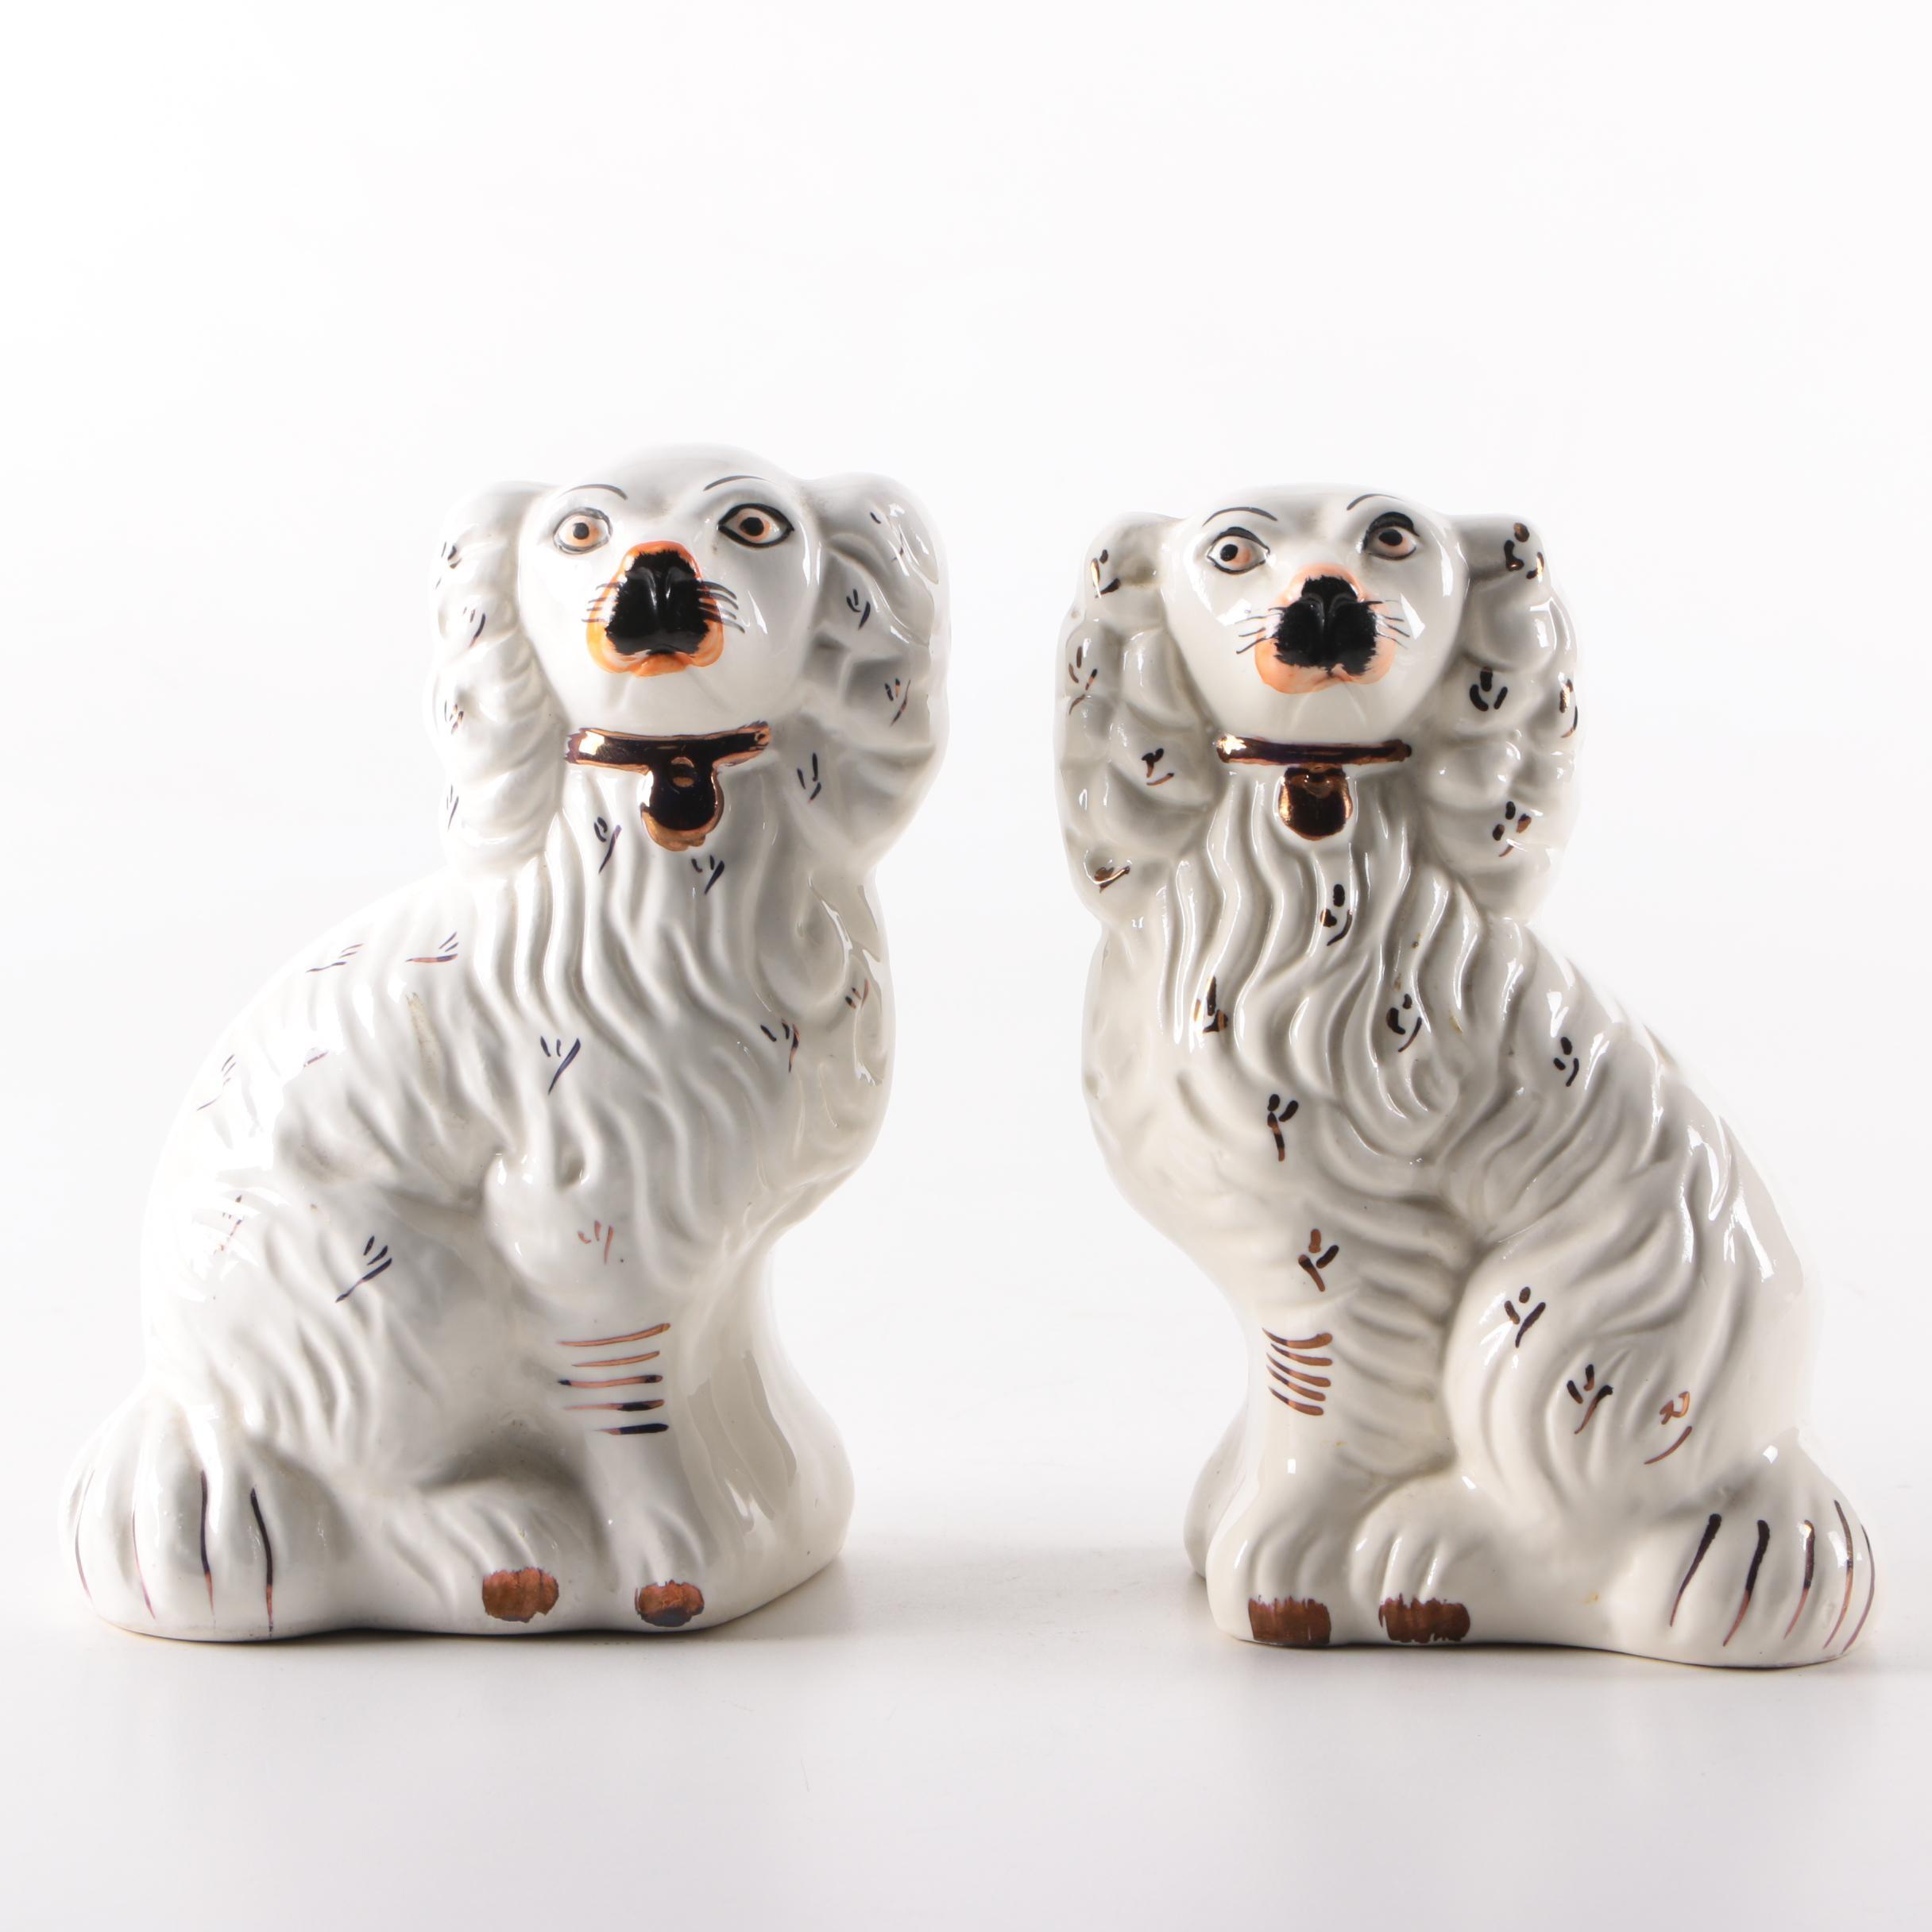 Vintage Staffordshire Style Porcelain Spaniel Figurines